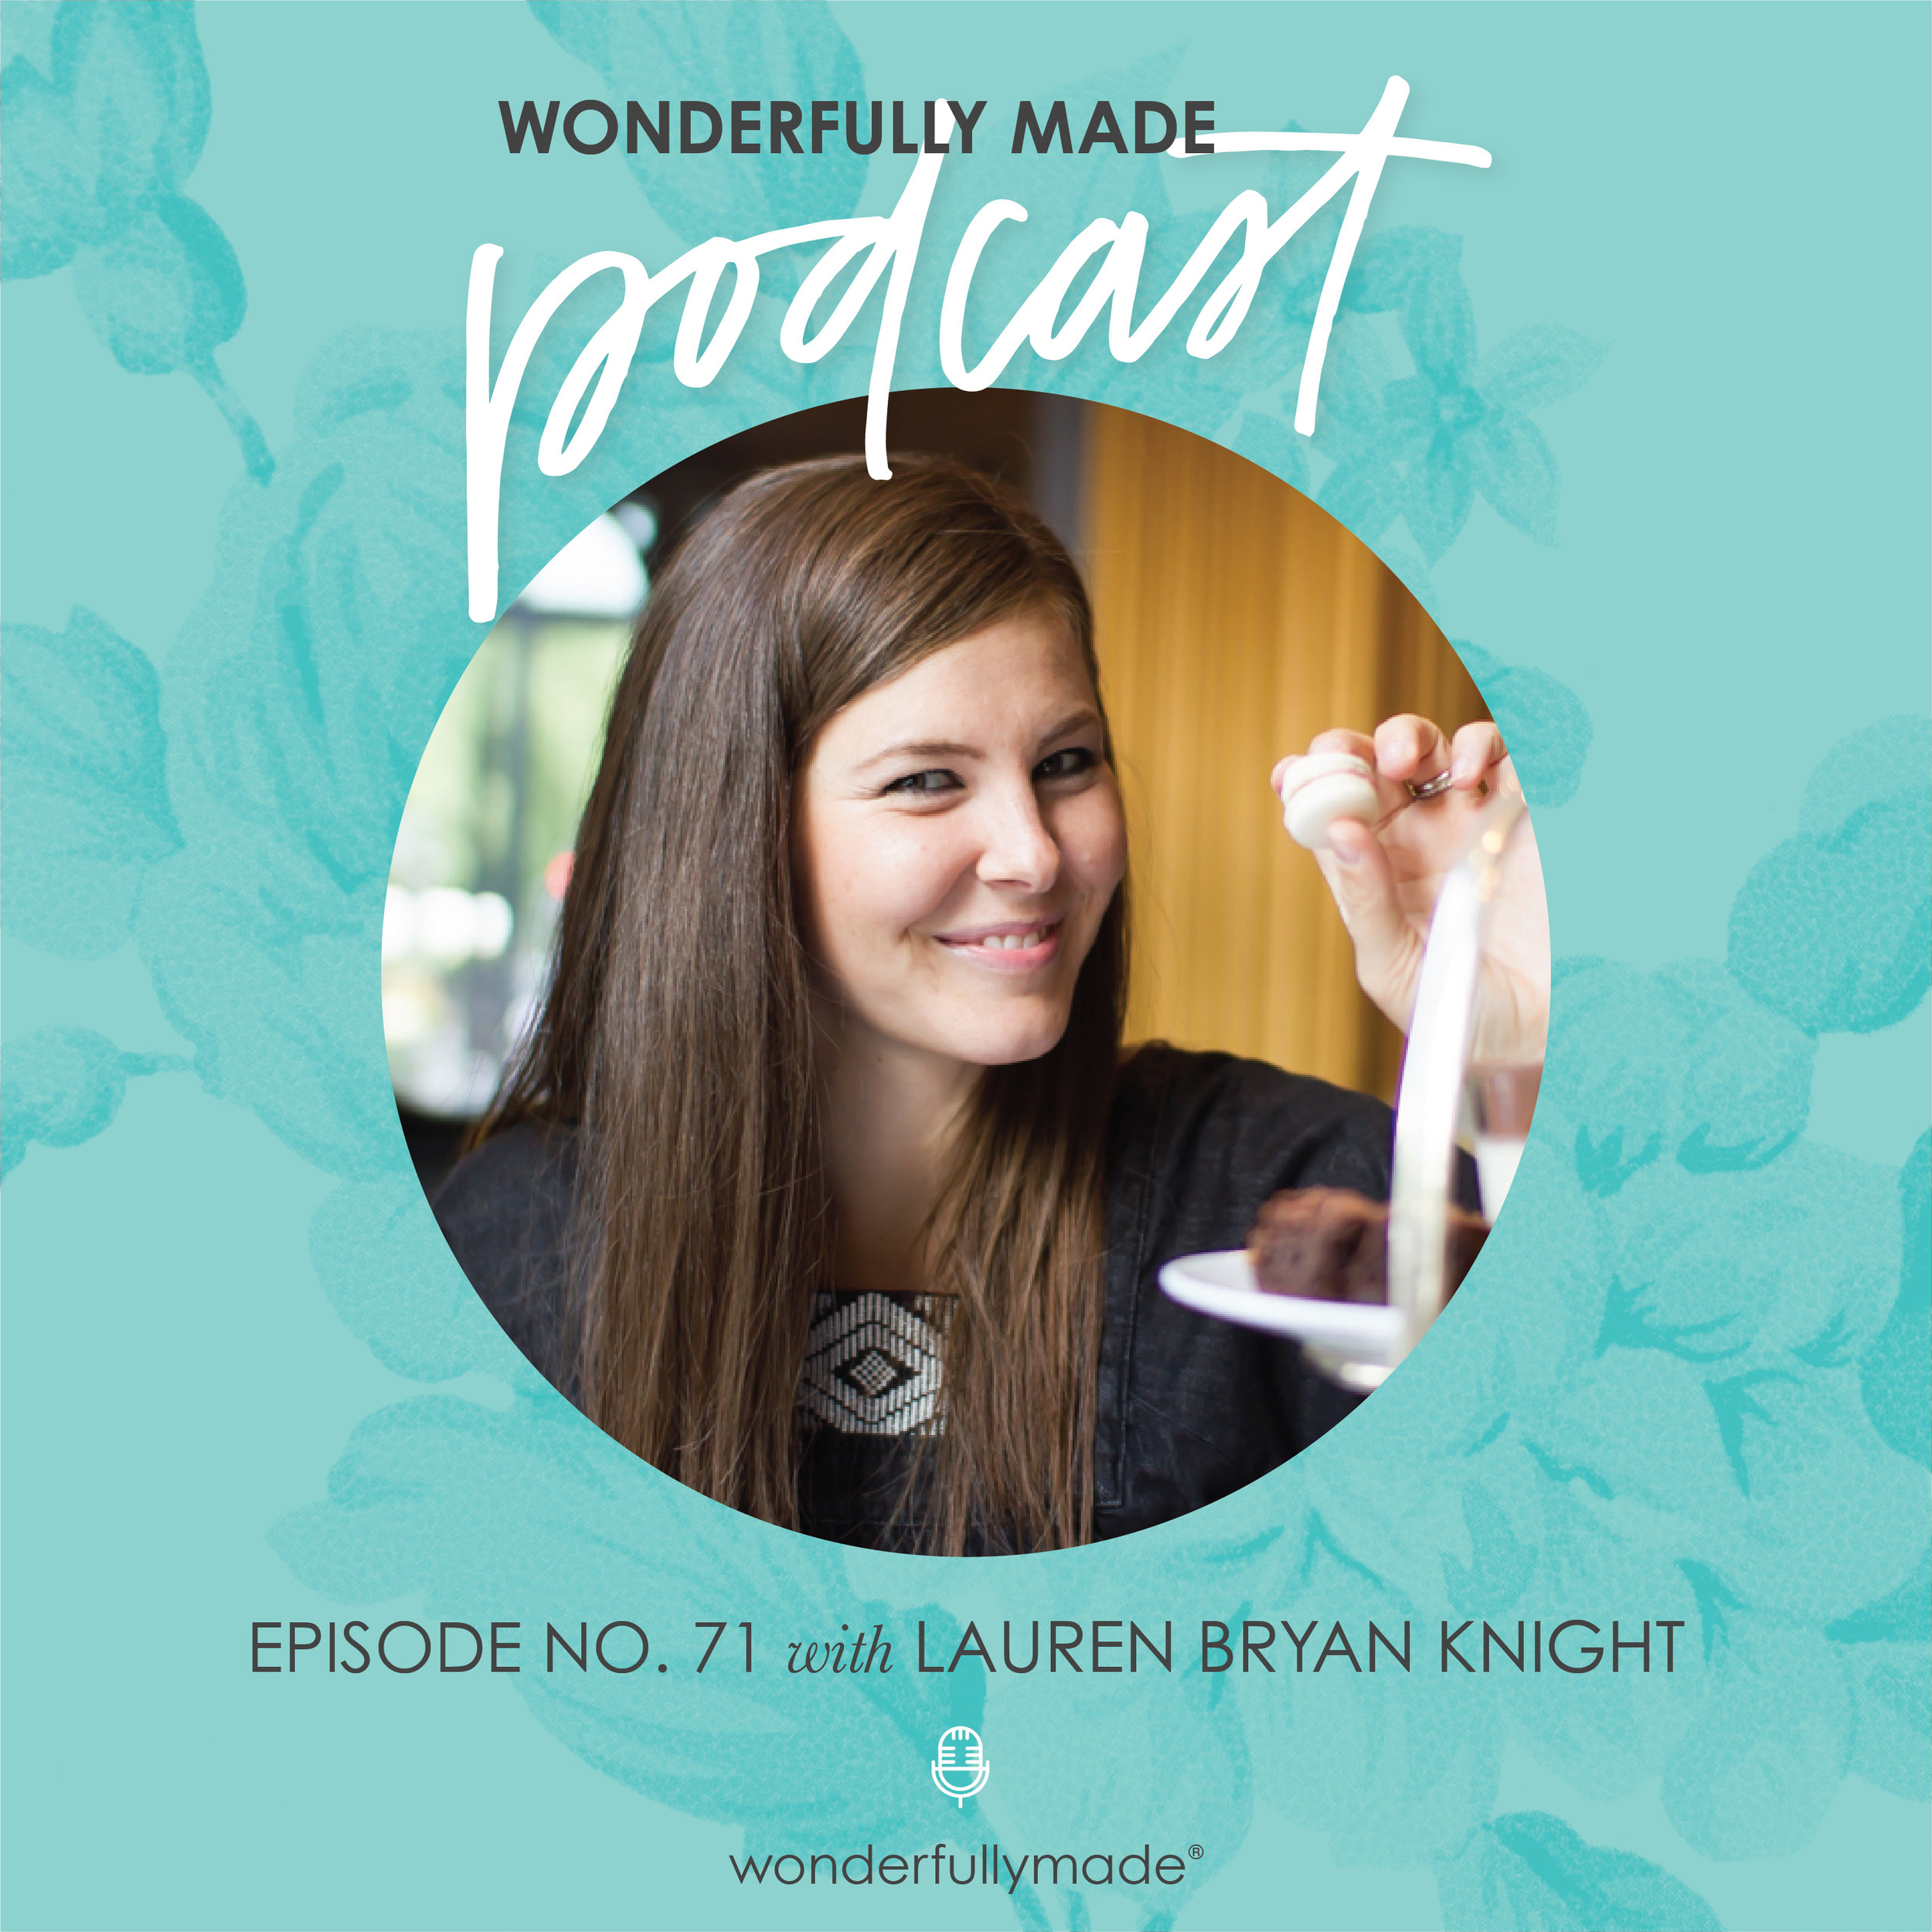 Wonderfully-Made-Podcast_Lauren-Bryan-Knight.jpg